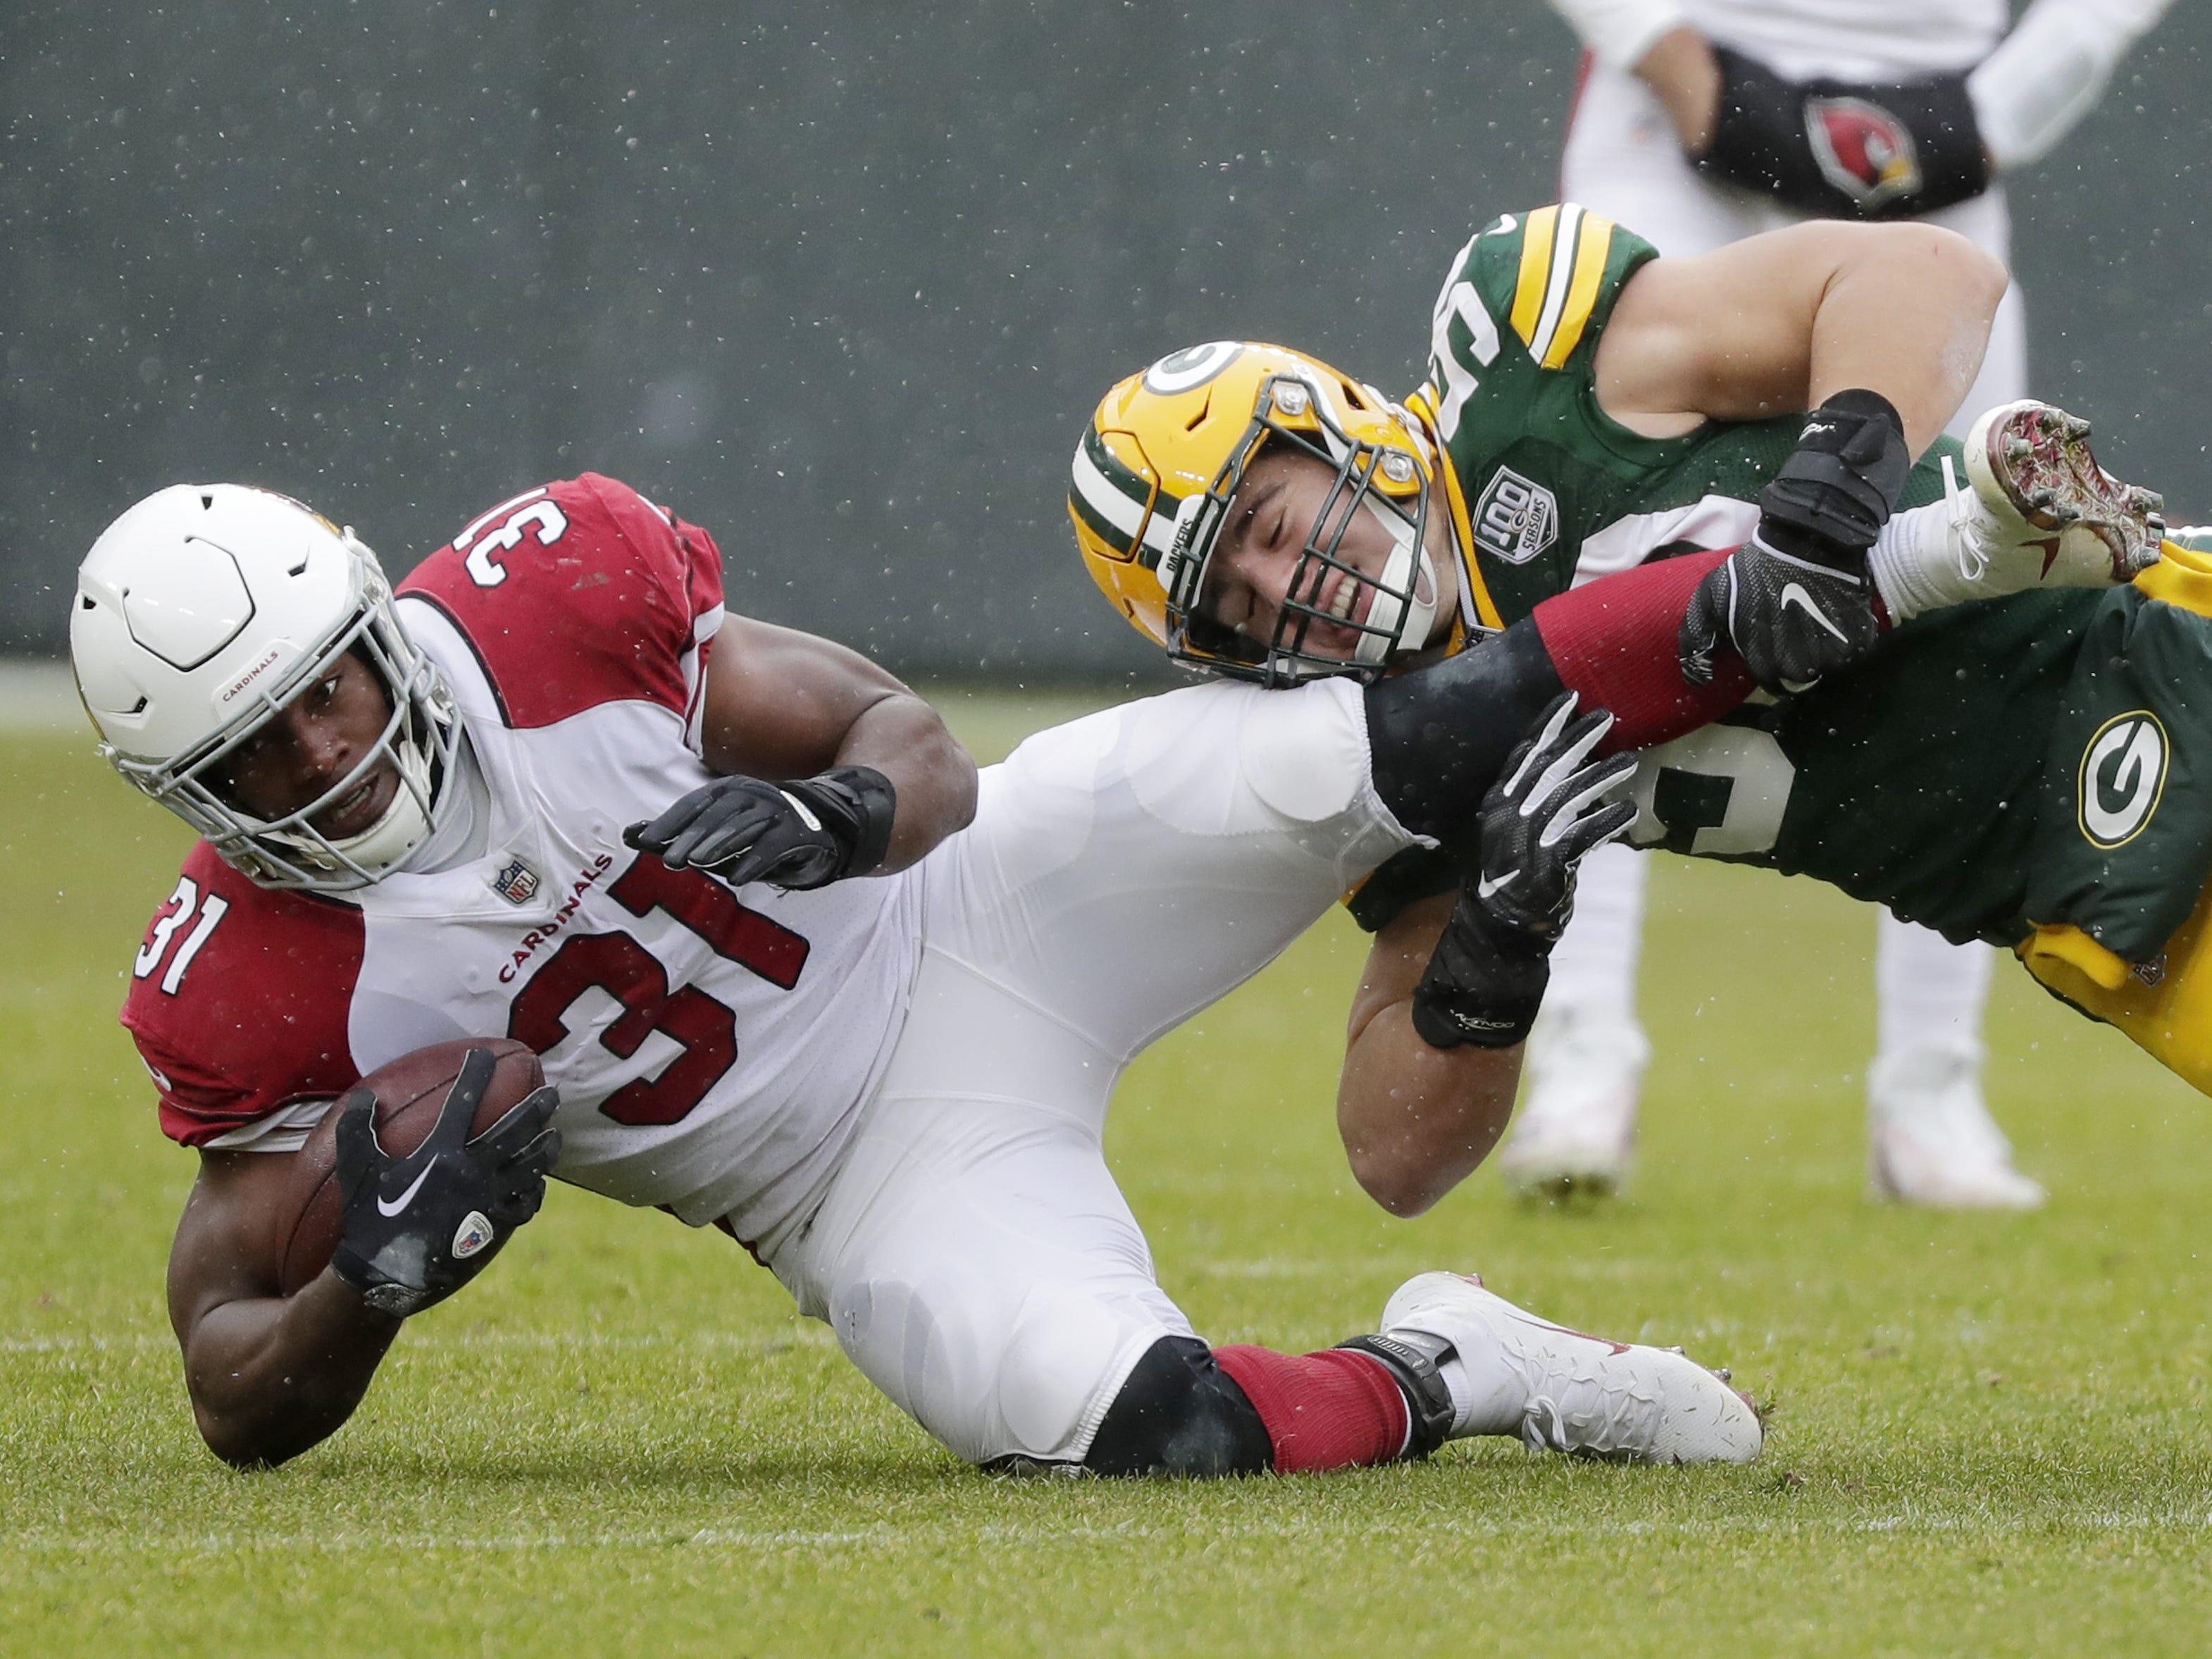 Green Bay Packers linebacker Blake Martinez (50) tackles Arizona Cardinals running back David Johnson (31) in the first quarter at Lambeau Field on Sunday, December 2, 2018 in Green Bay, Wis.